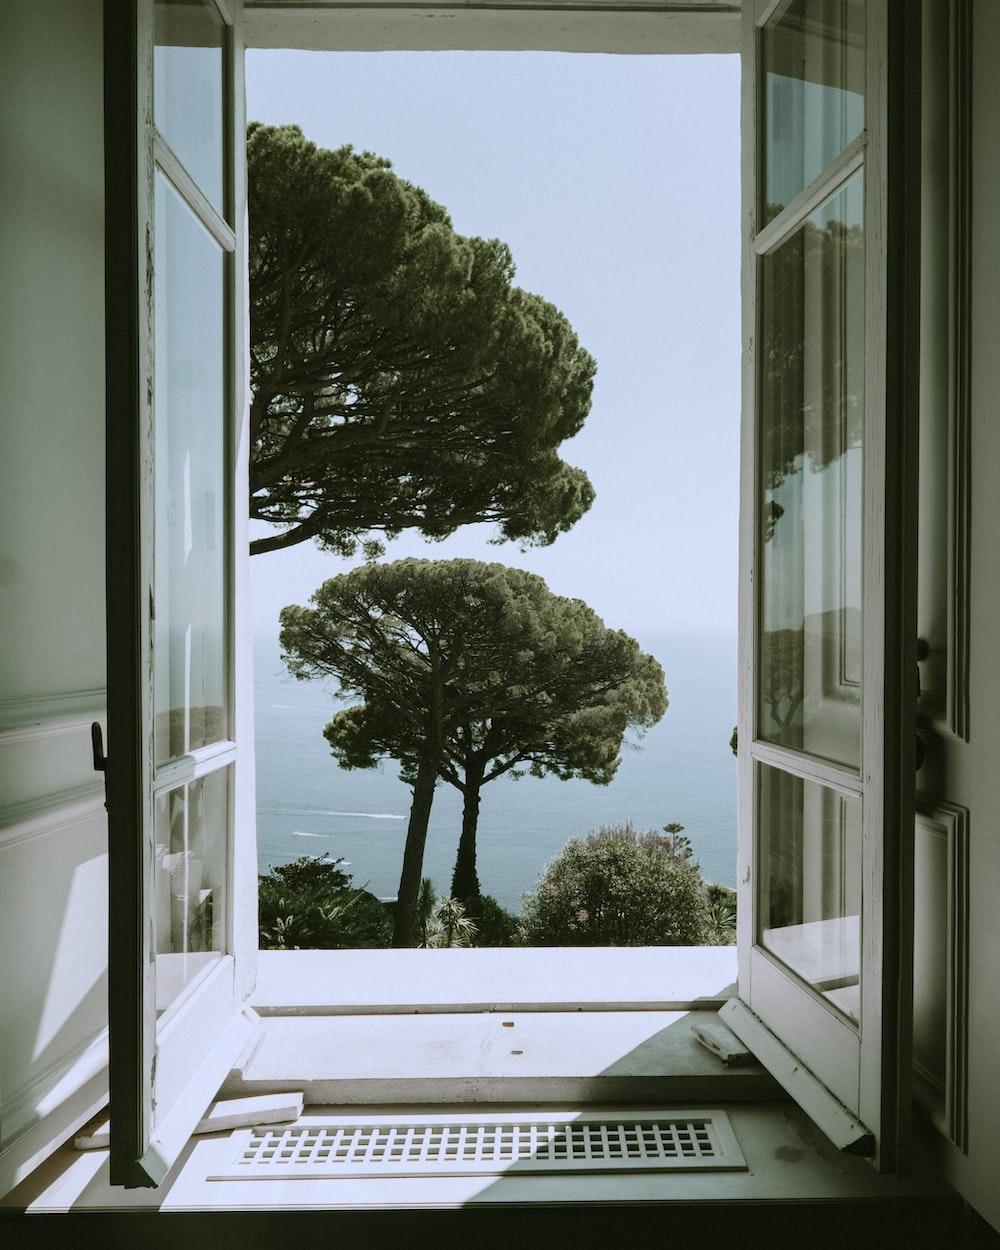 green tree beside white wooden framed glass window